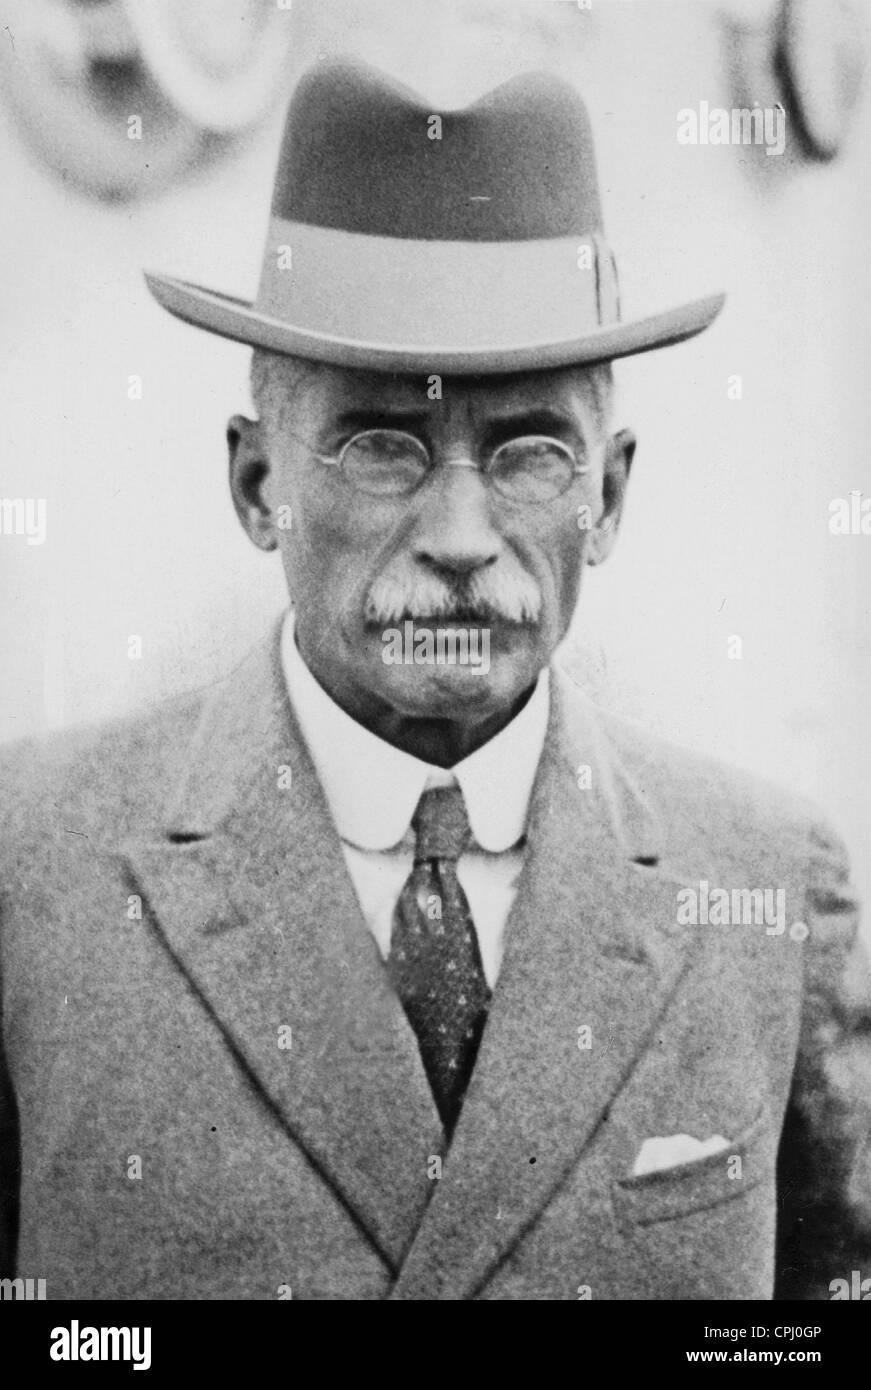 James Barry Munnik Hertzog, 1933 - Stock Image